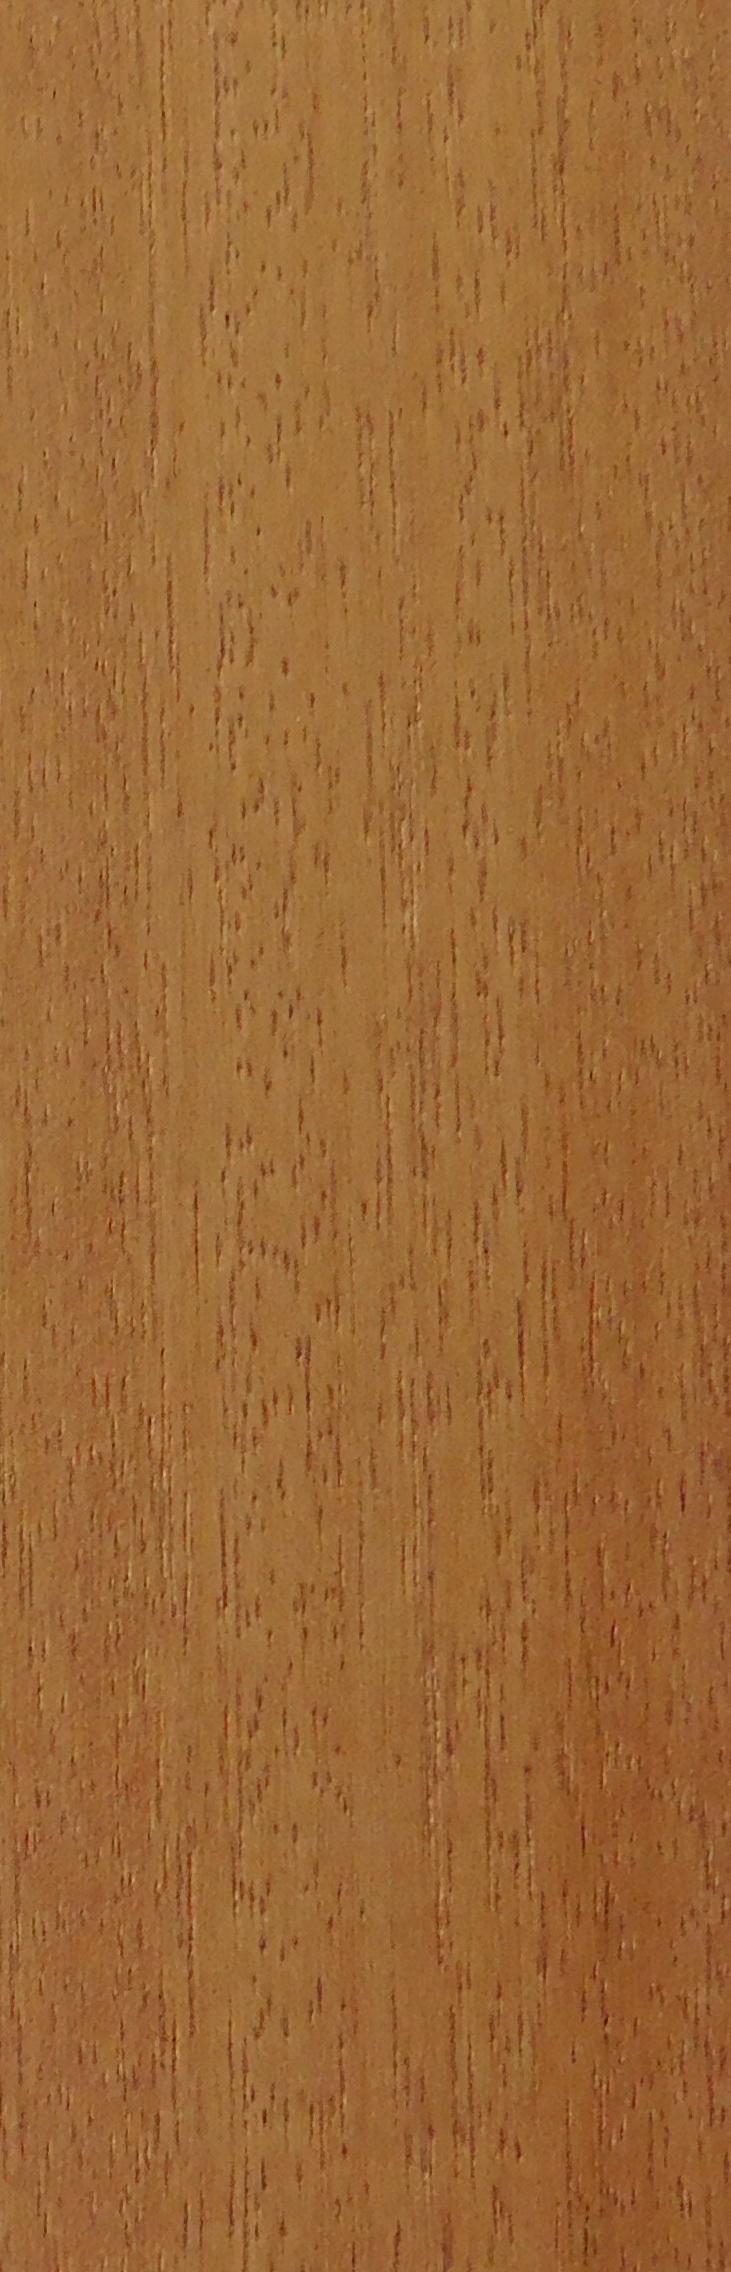 Saffron Basic Wood Blinds Slat